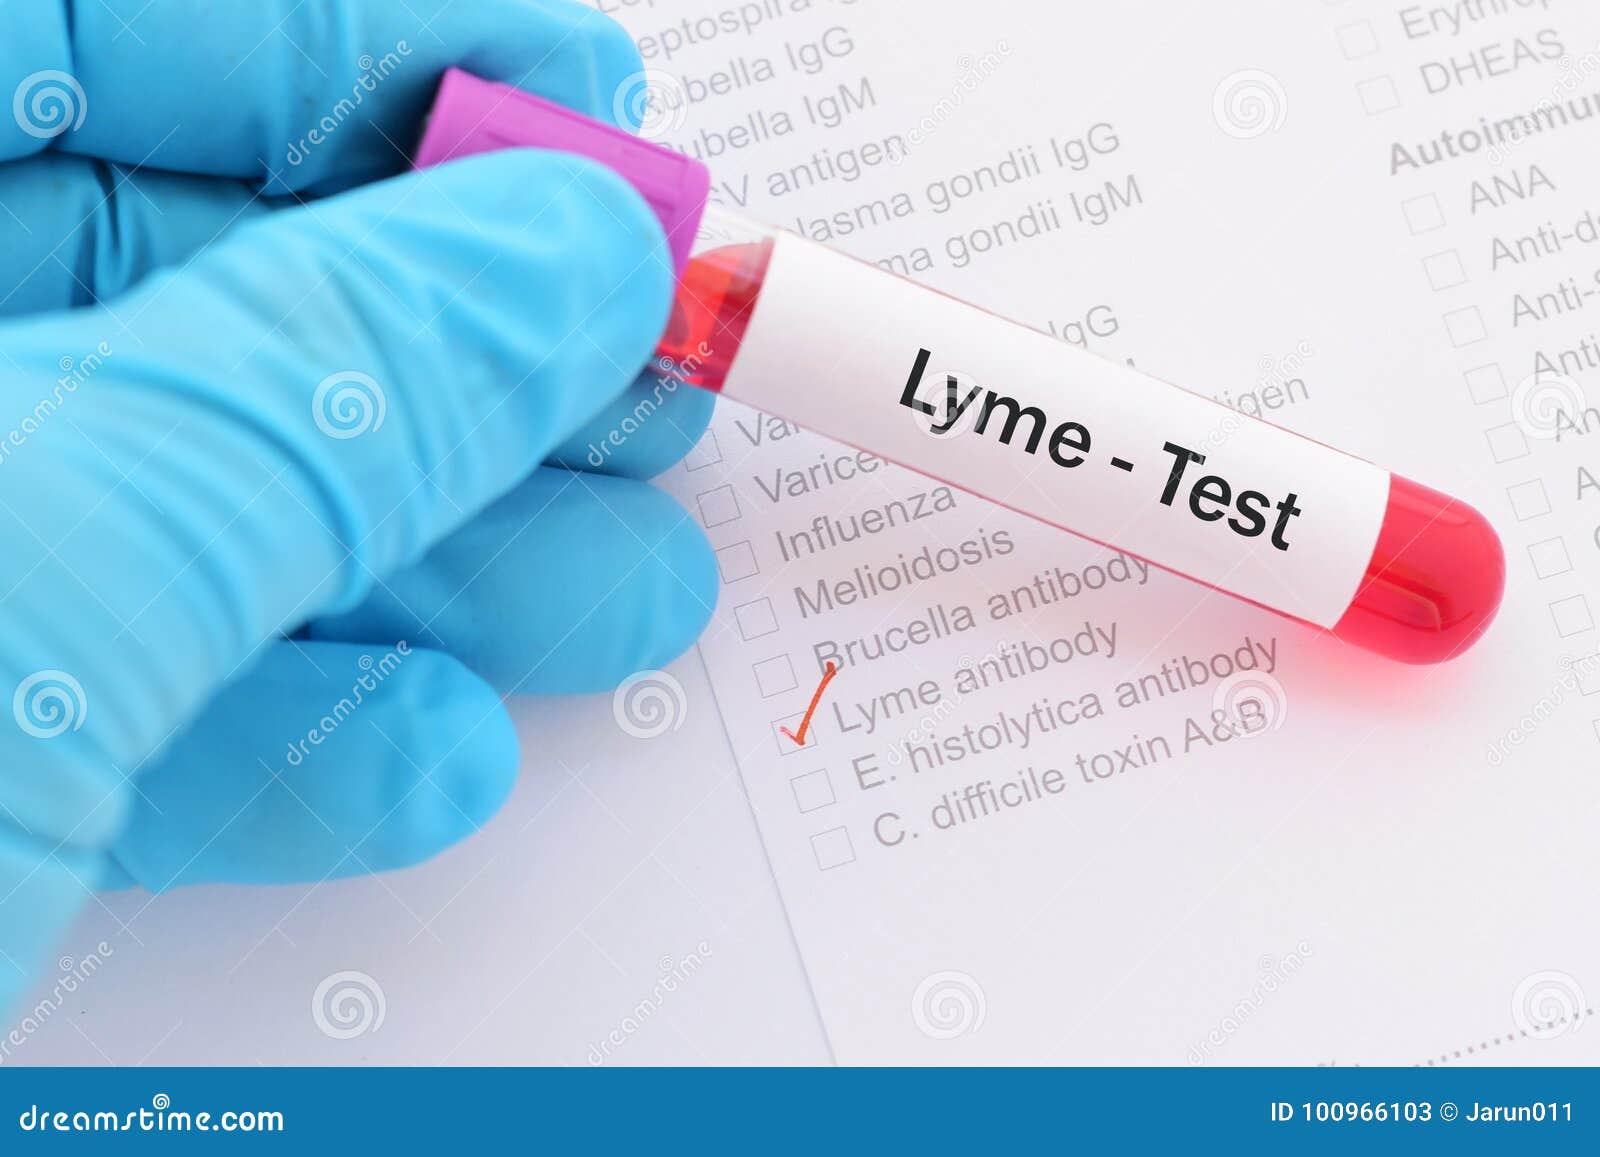 Lyme disease test stock image  Image of infection, immunology